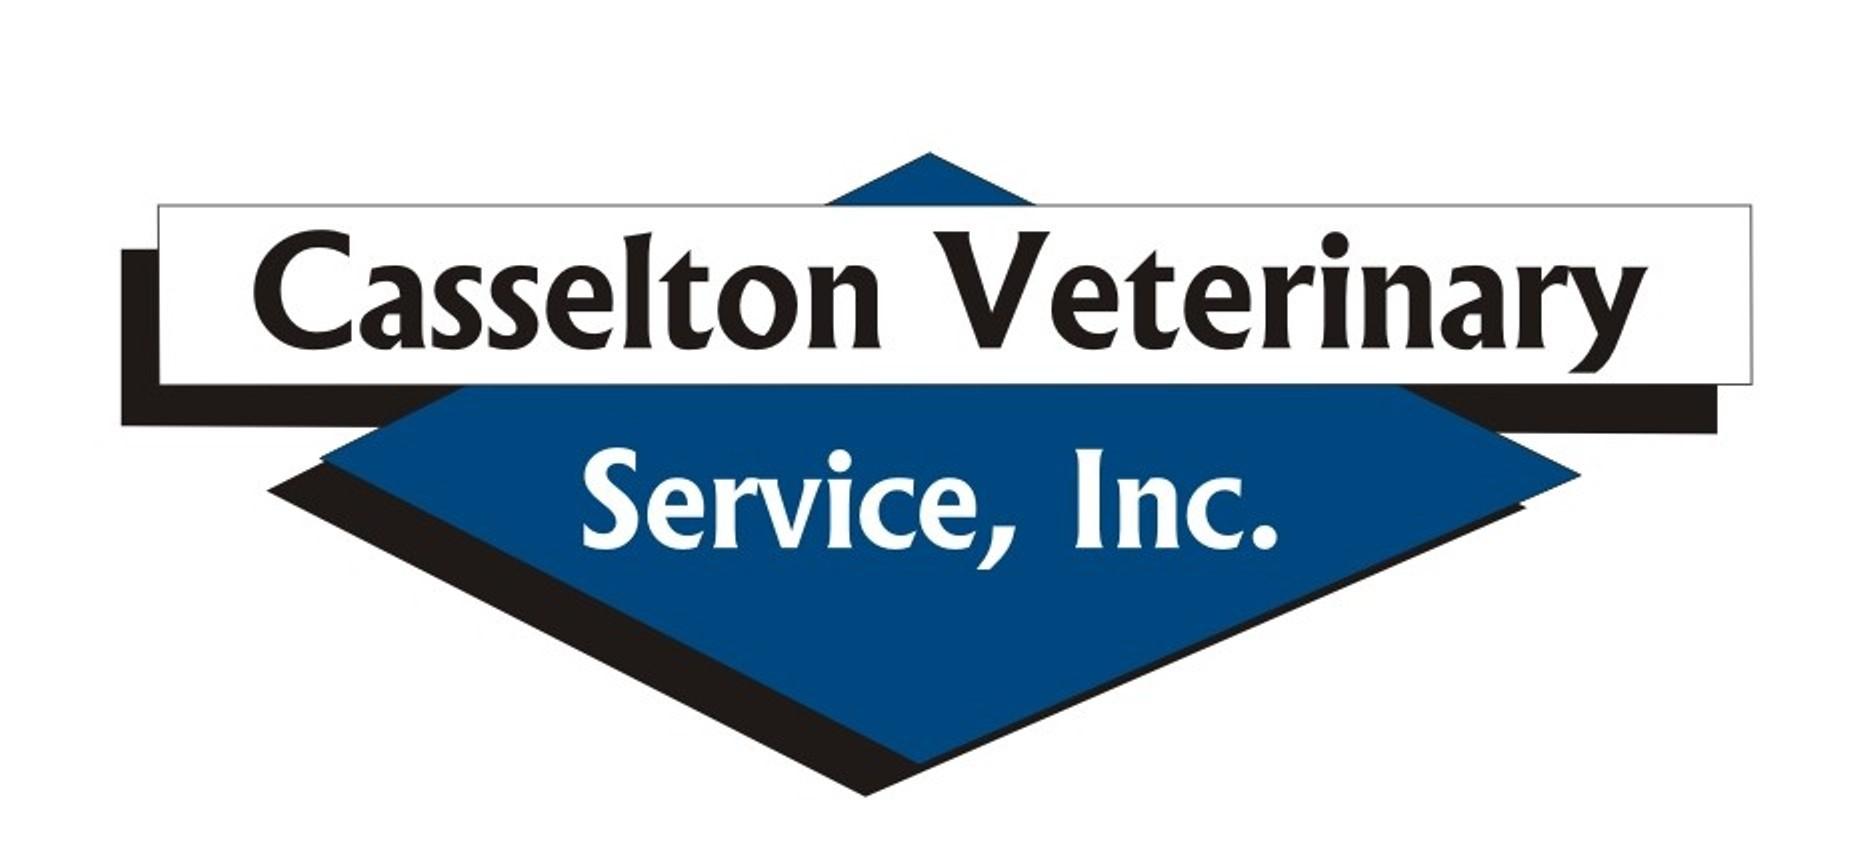 Casselton Veterinary Service, Inc.